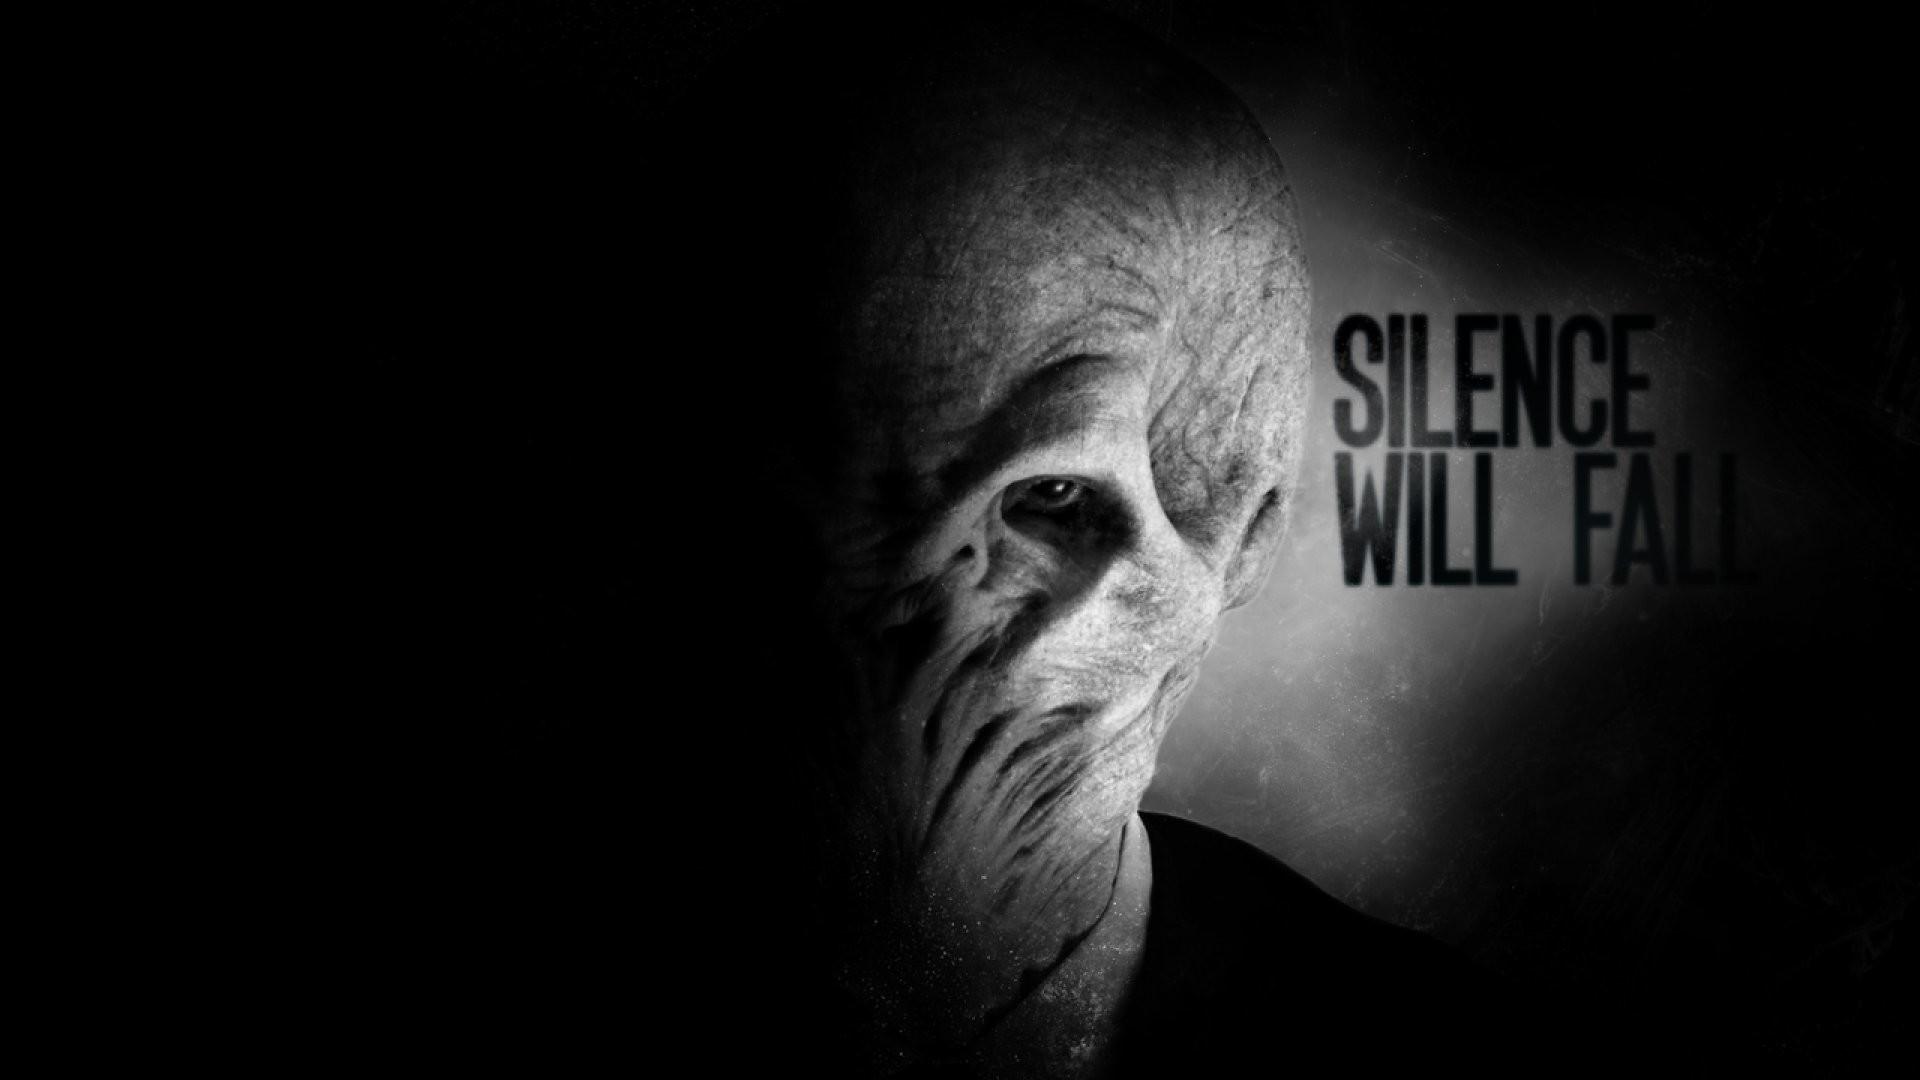 Doctor Who Bbc Sci-fi Futuristic Series Comedy Adventure Drama 1dwho Tardis  Wallpaper At Dark Wallpapers